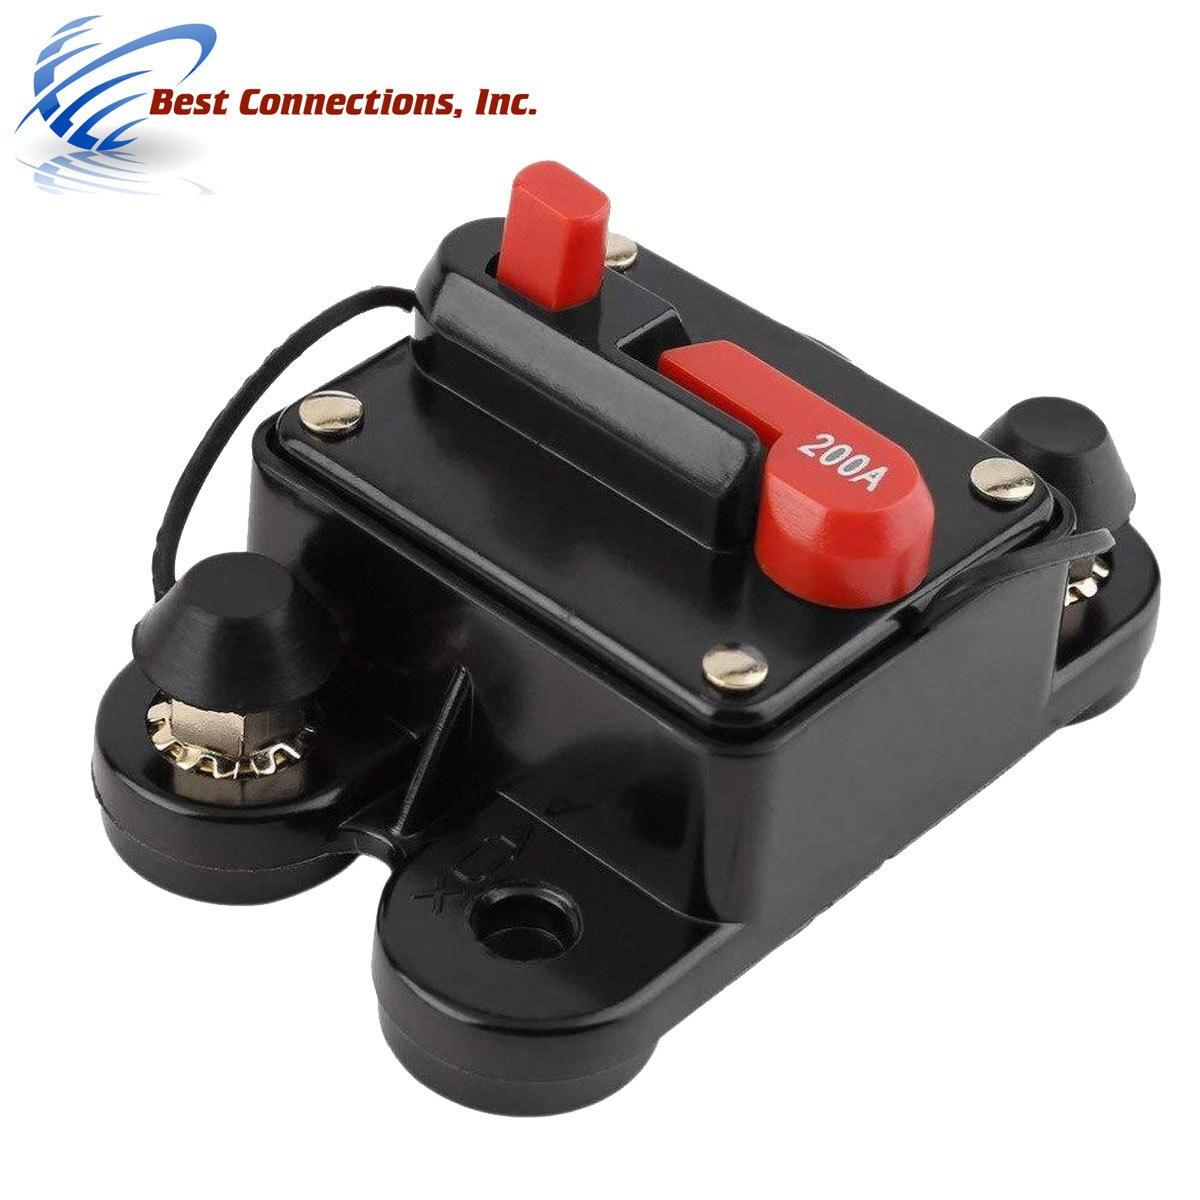 Motor Fuse Holders Inverter Circuit Breaker Car Audio Solar Energy Inline Circuit Breaker Fuse Inverter With Waterproof Cover For Motor Auto Car Marine Boat 80A